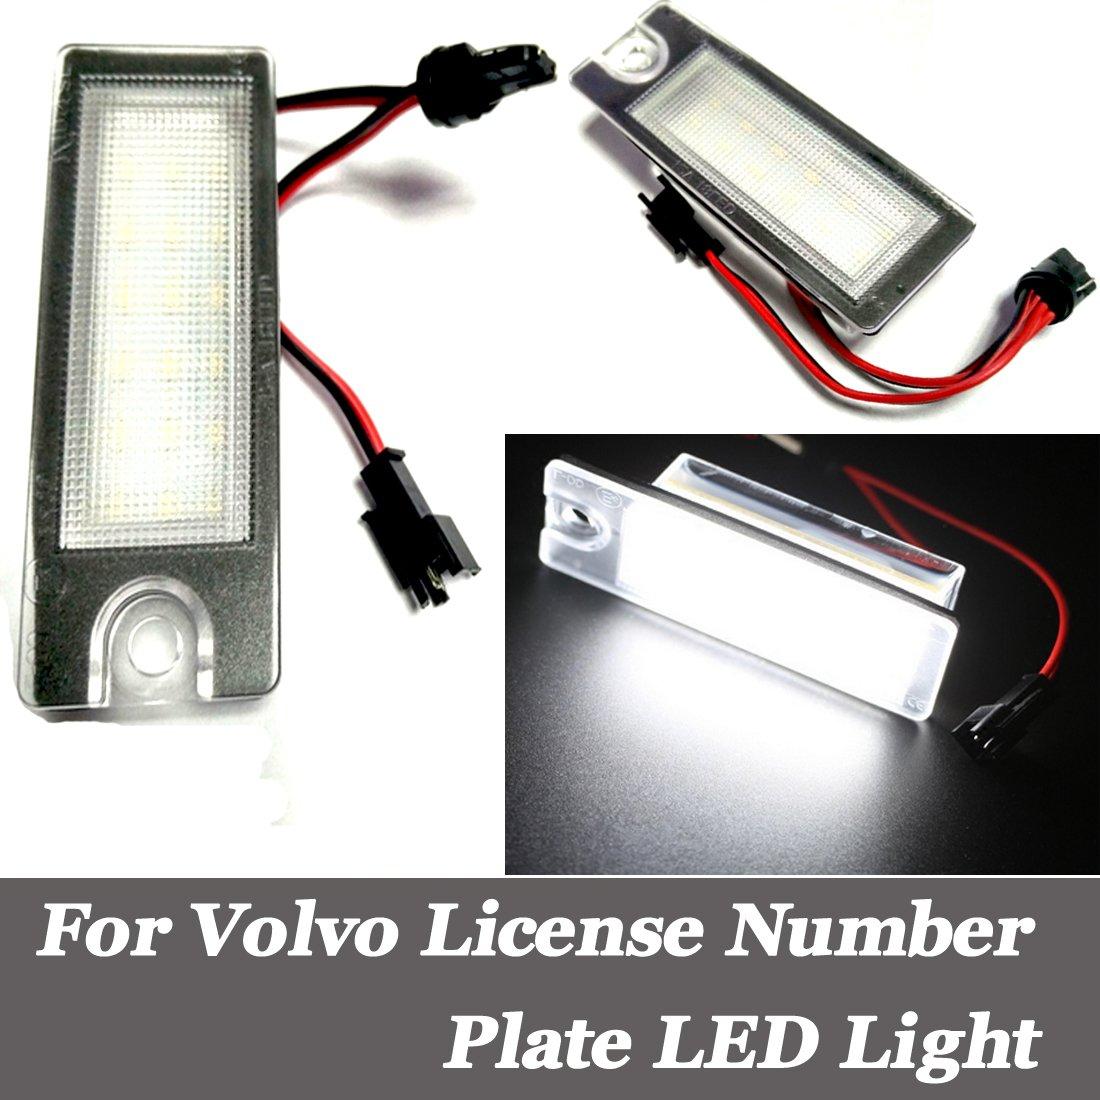 For S60 S80 V70 Xc70 Xc90 License Plate Lights Dc12v Waterproof Car 2001 Volvo Battery Location Led Number Lamp 2packs Motorbike